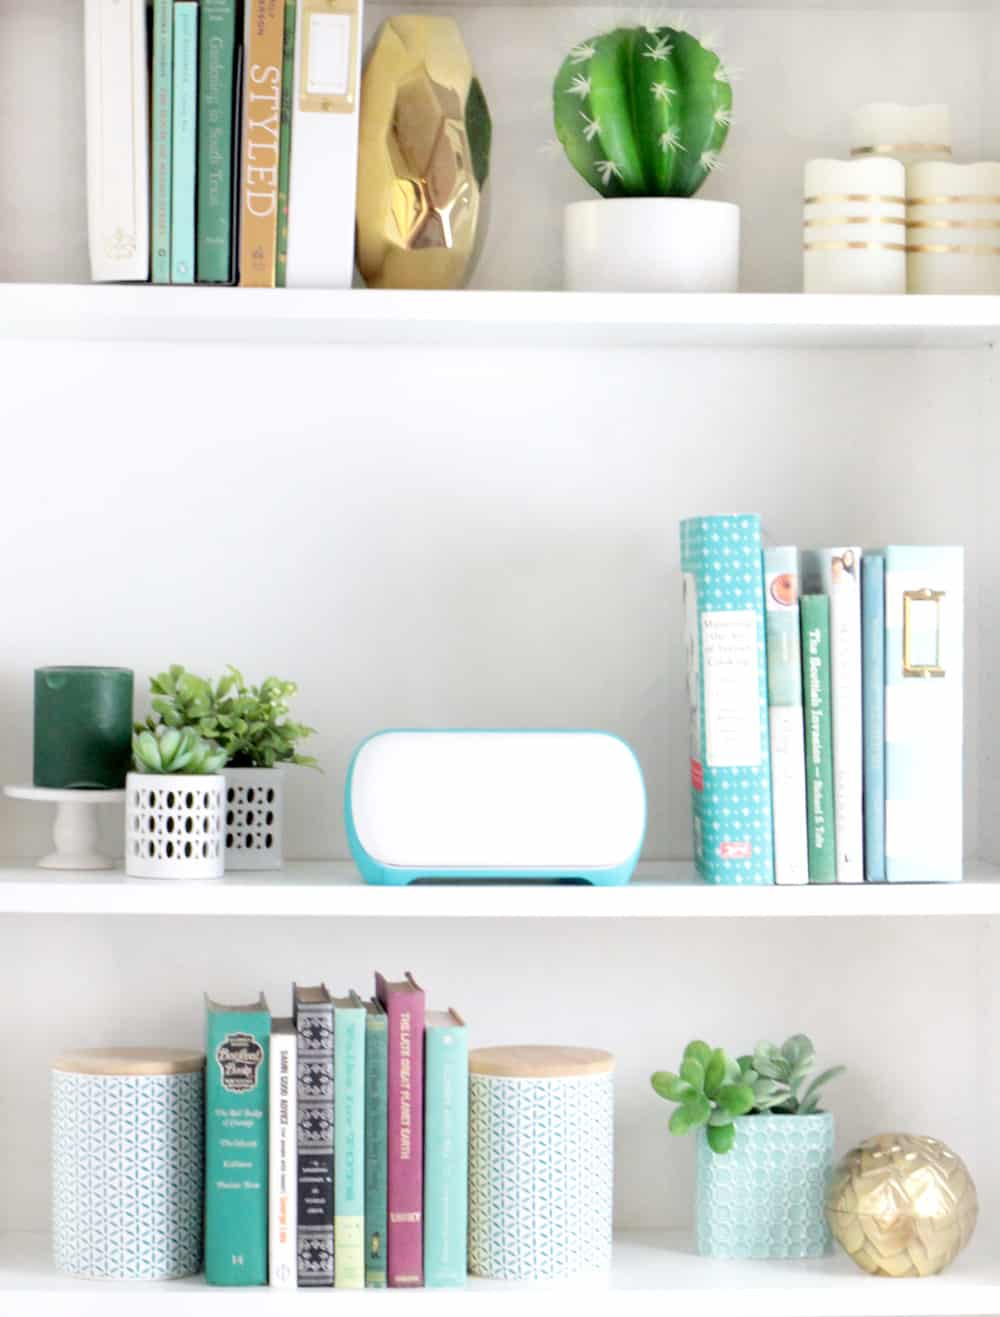 cute styled bookshelf with plants, books, and cricut joy